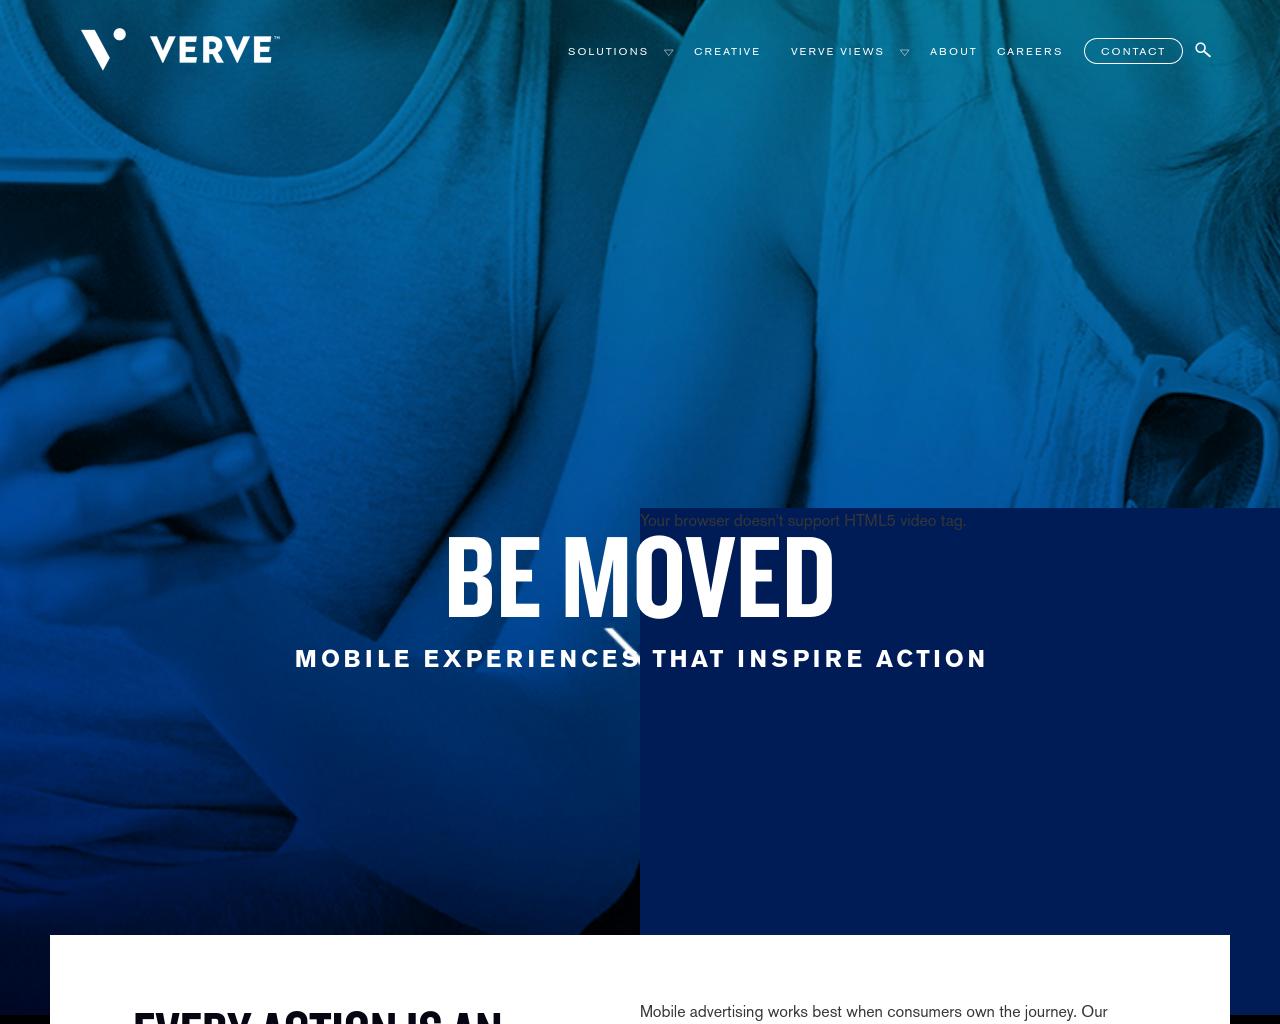 Verve-Advertising-Reviews-Pricing